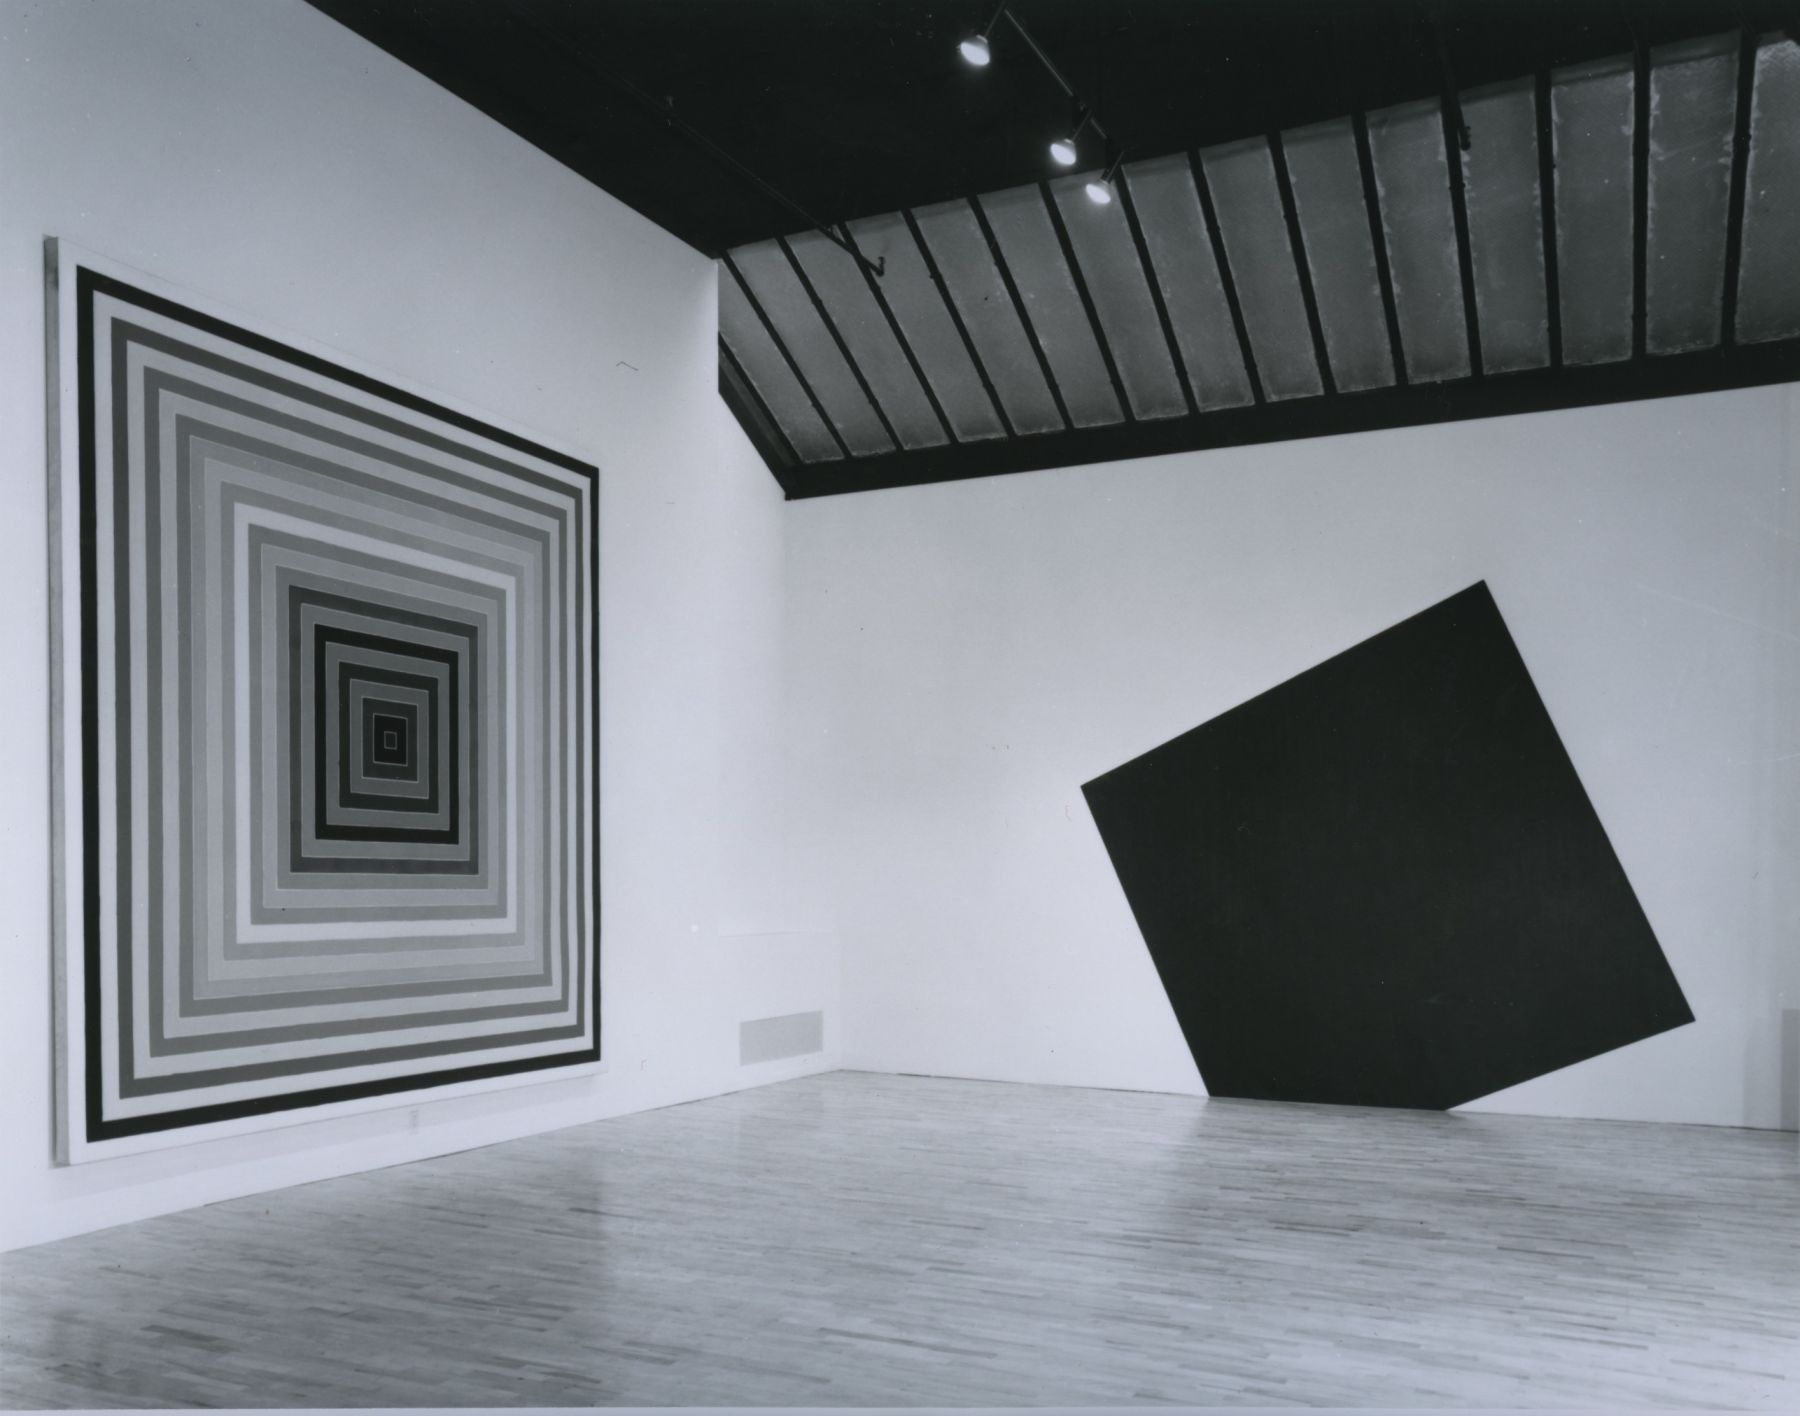 Installation view, Opening Exhibition, 142 GREENE.